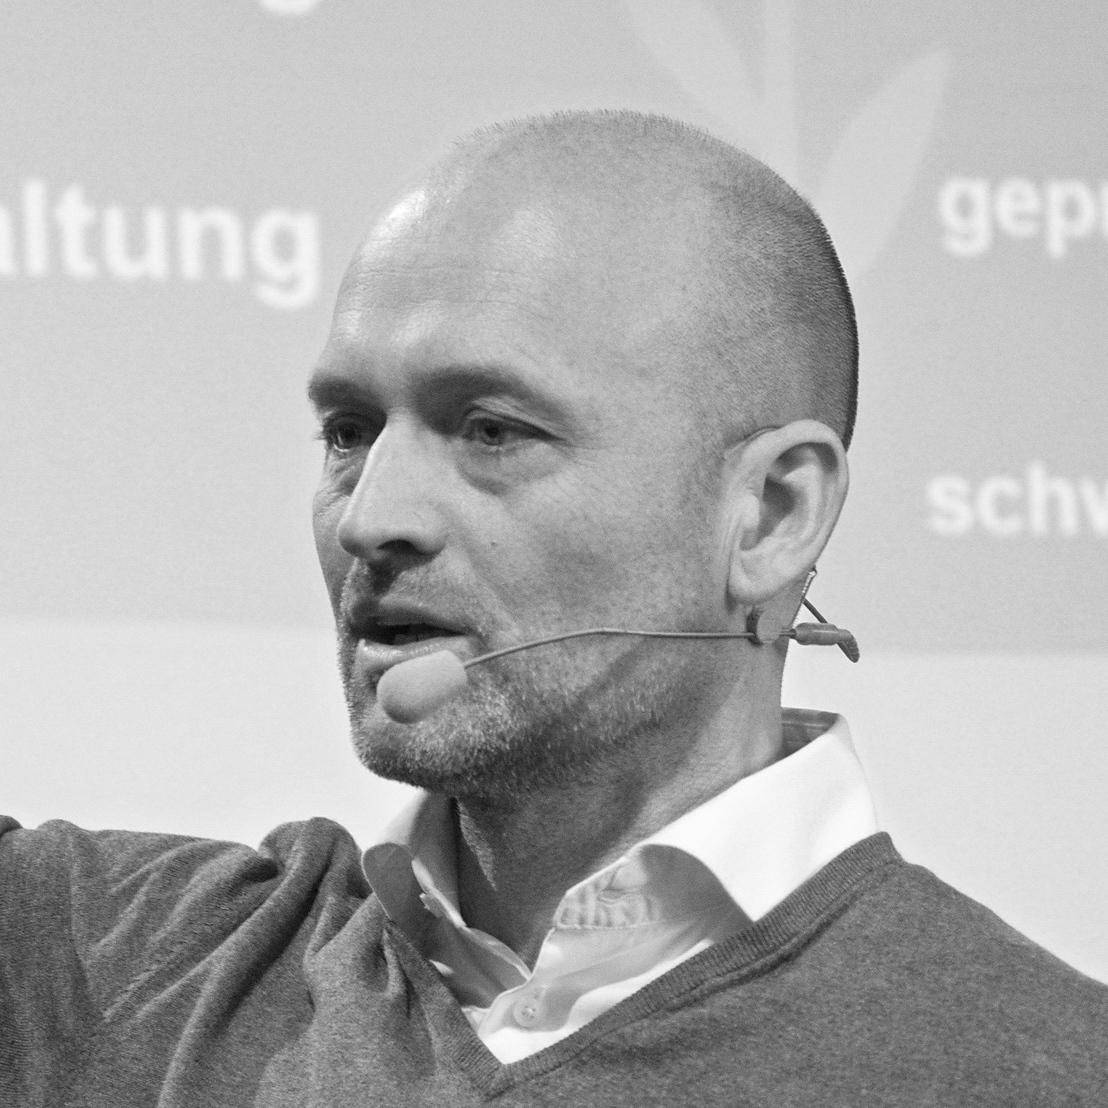 Frank H. Baumann-Habersack